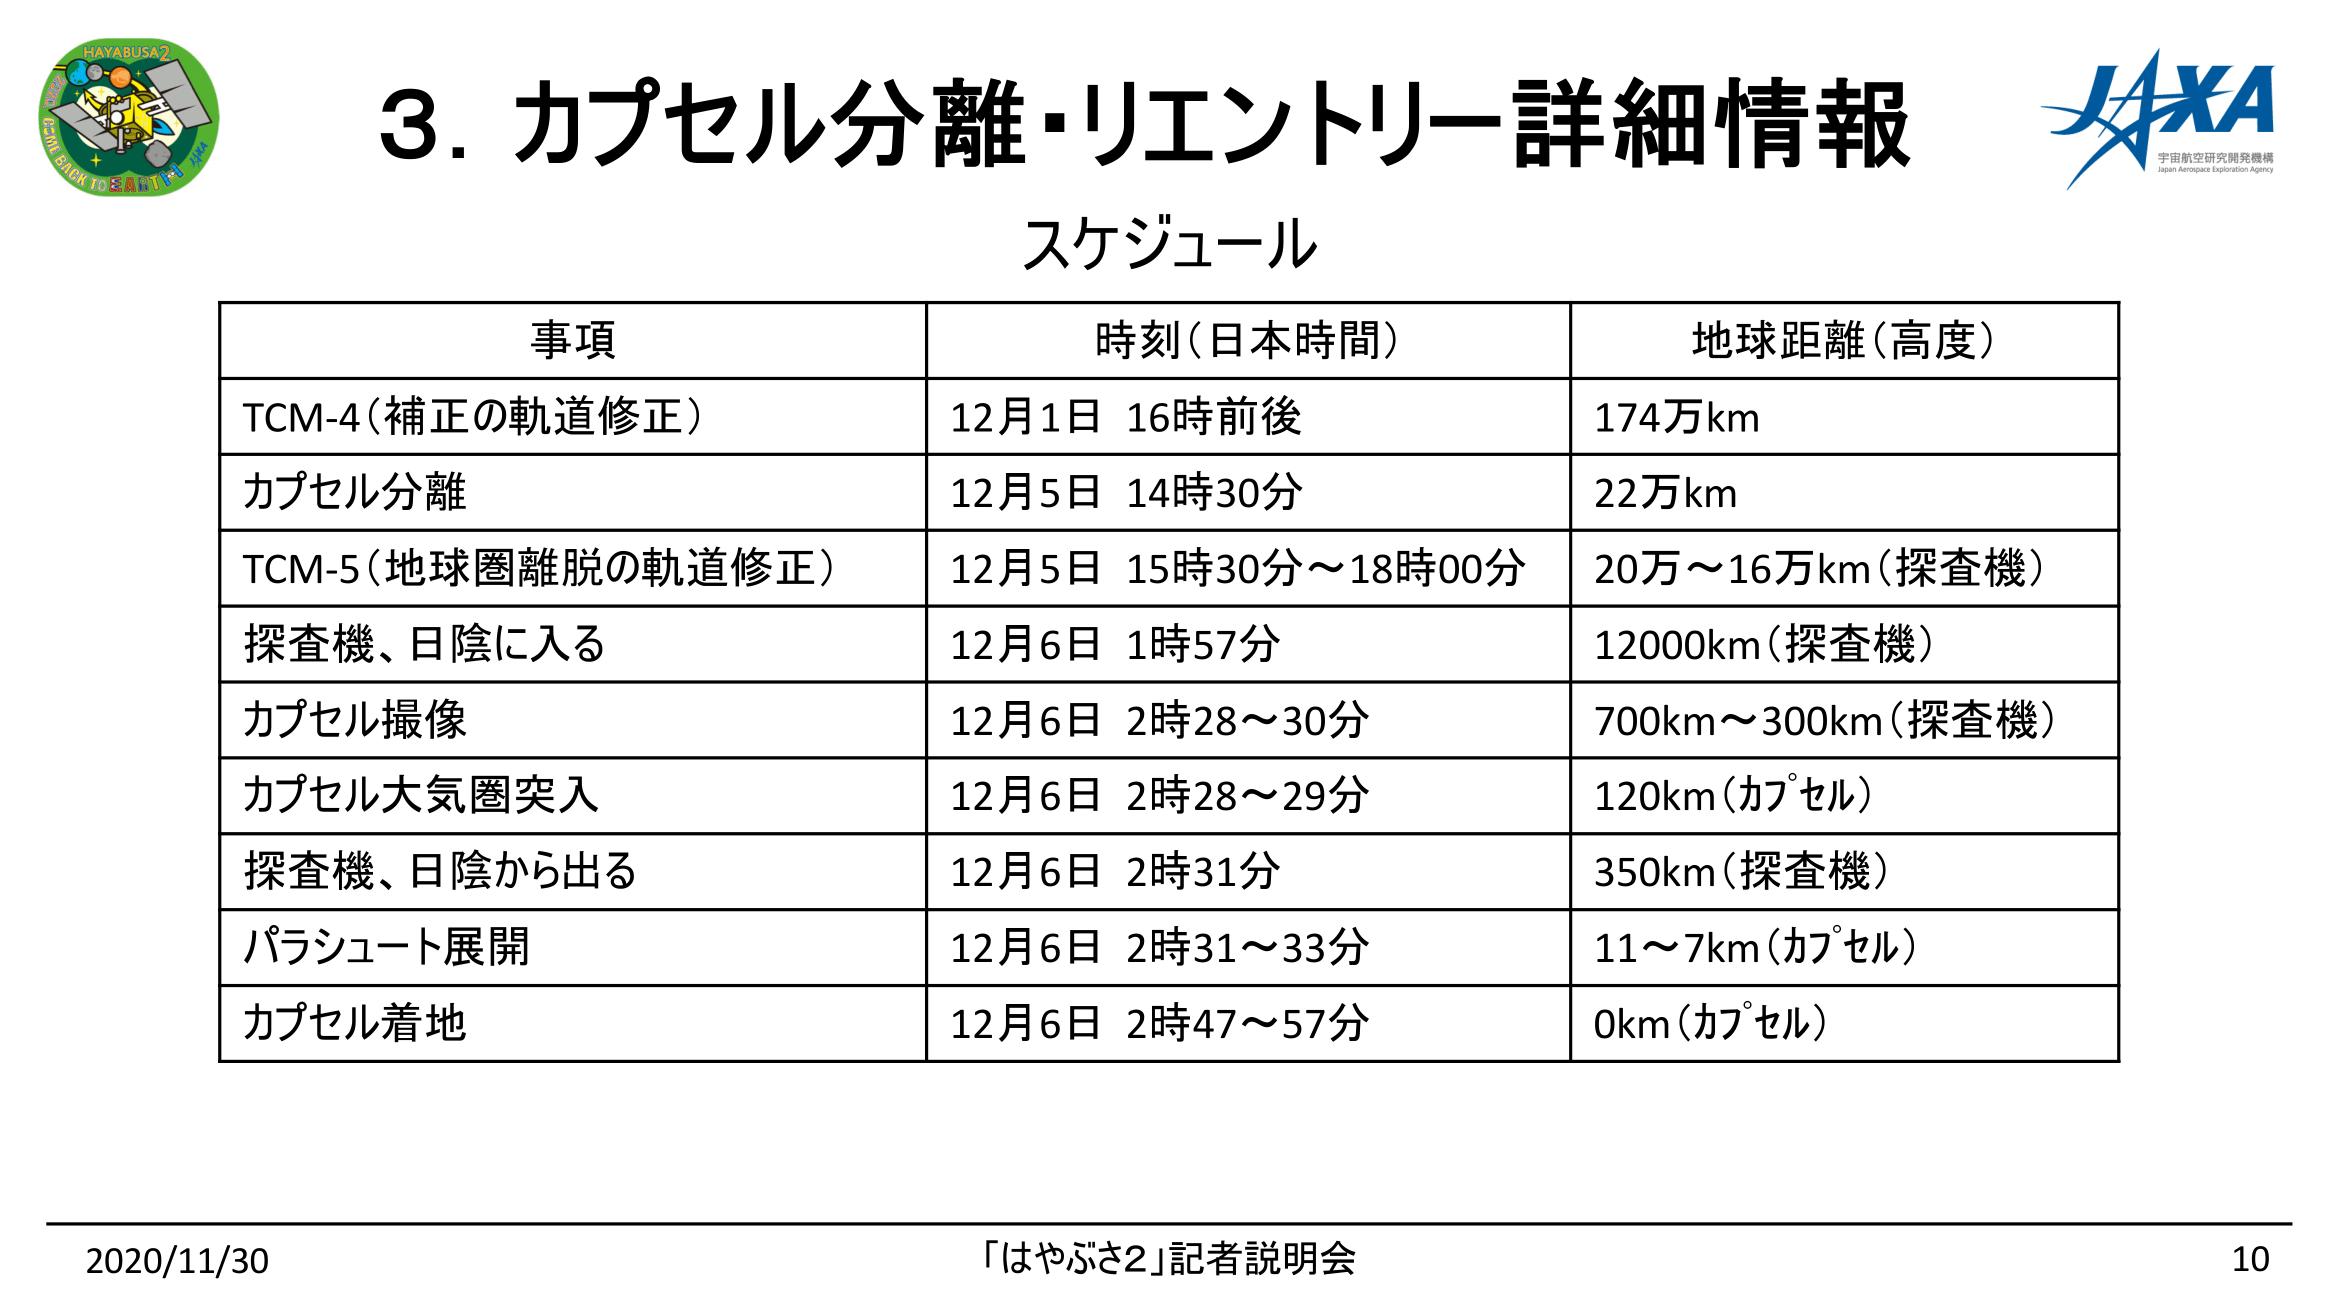 f:id:Imamura:20201130154052p:plain